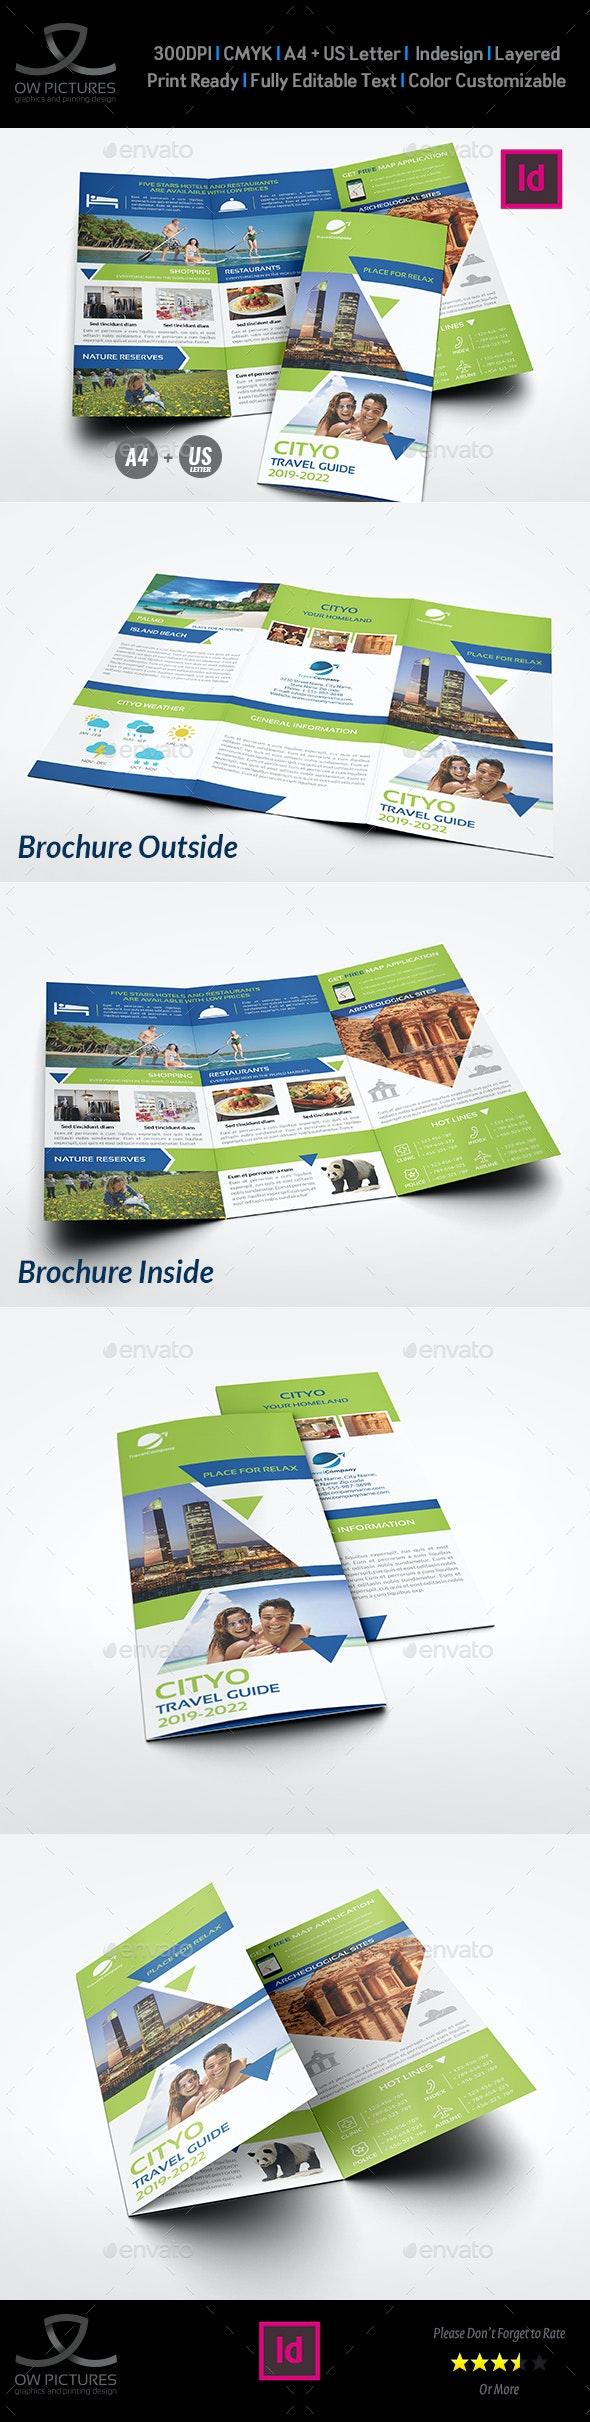 Travel Guide Tri Fold Brochure Template - Brochures Print Templates